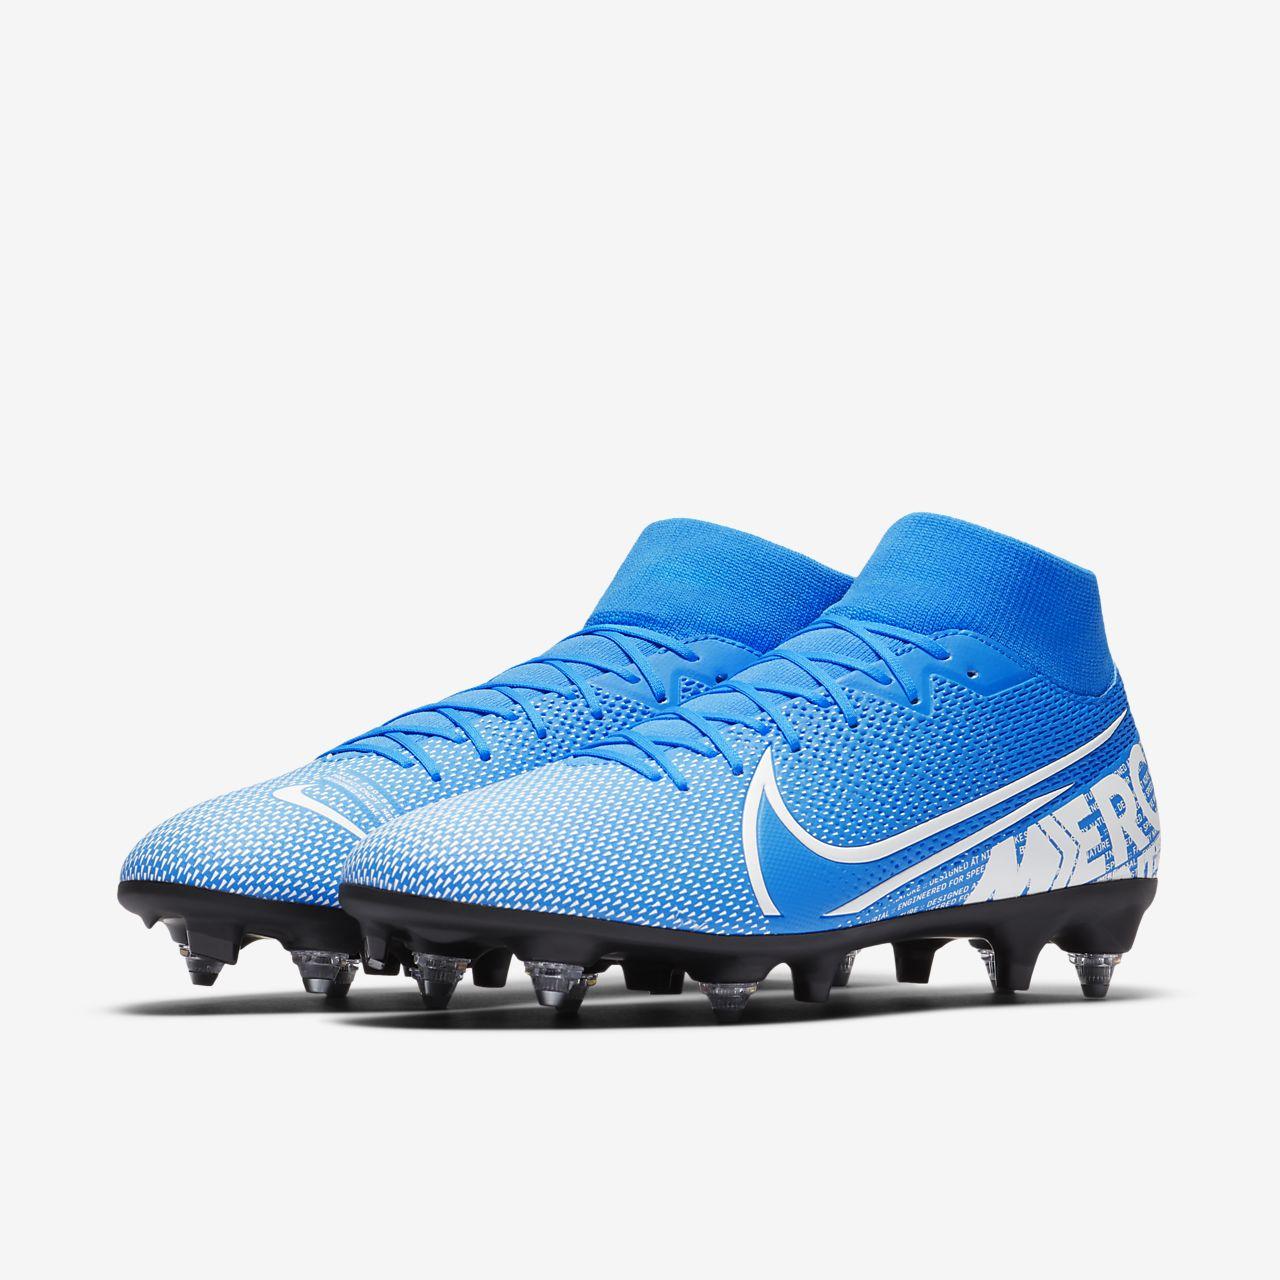 Chaussure de football à crampons pour terrain gras Nike Mercurial Superfly 7 Academy SG PRO Anti Clog Traction